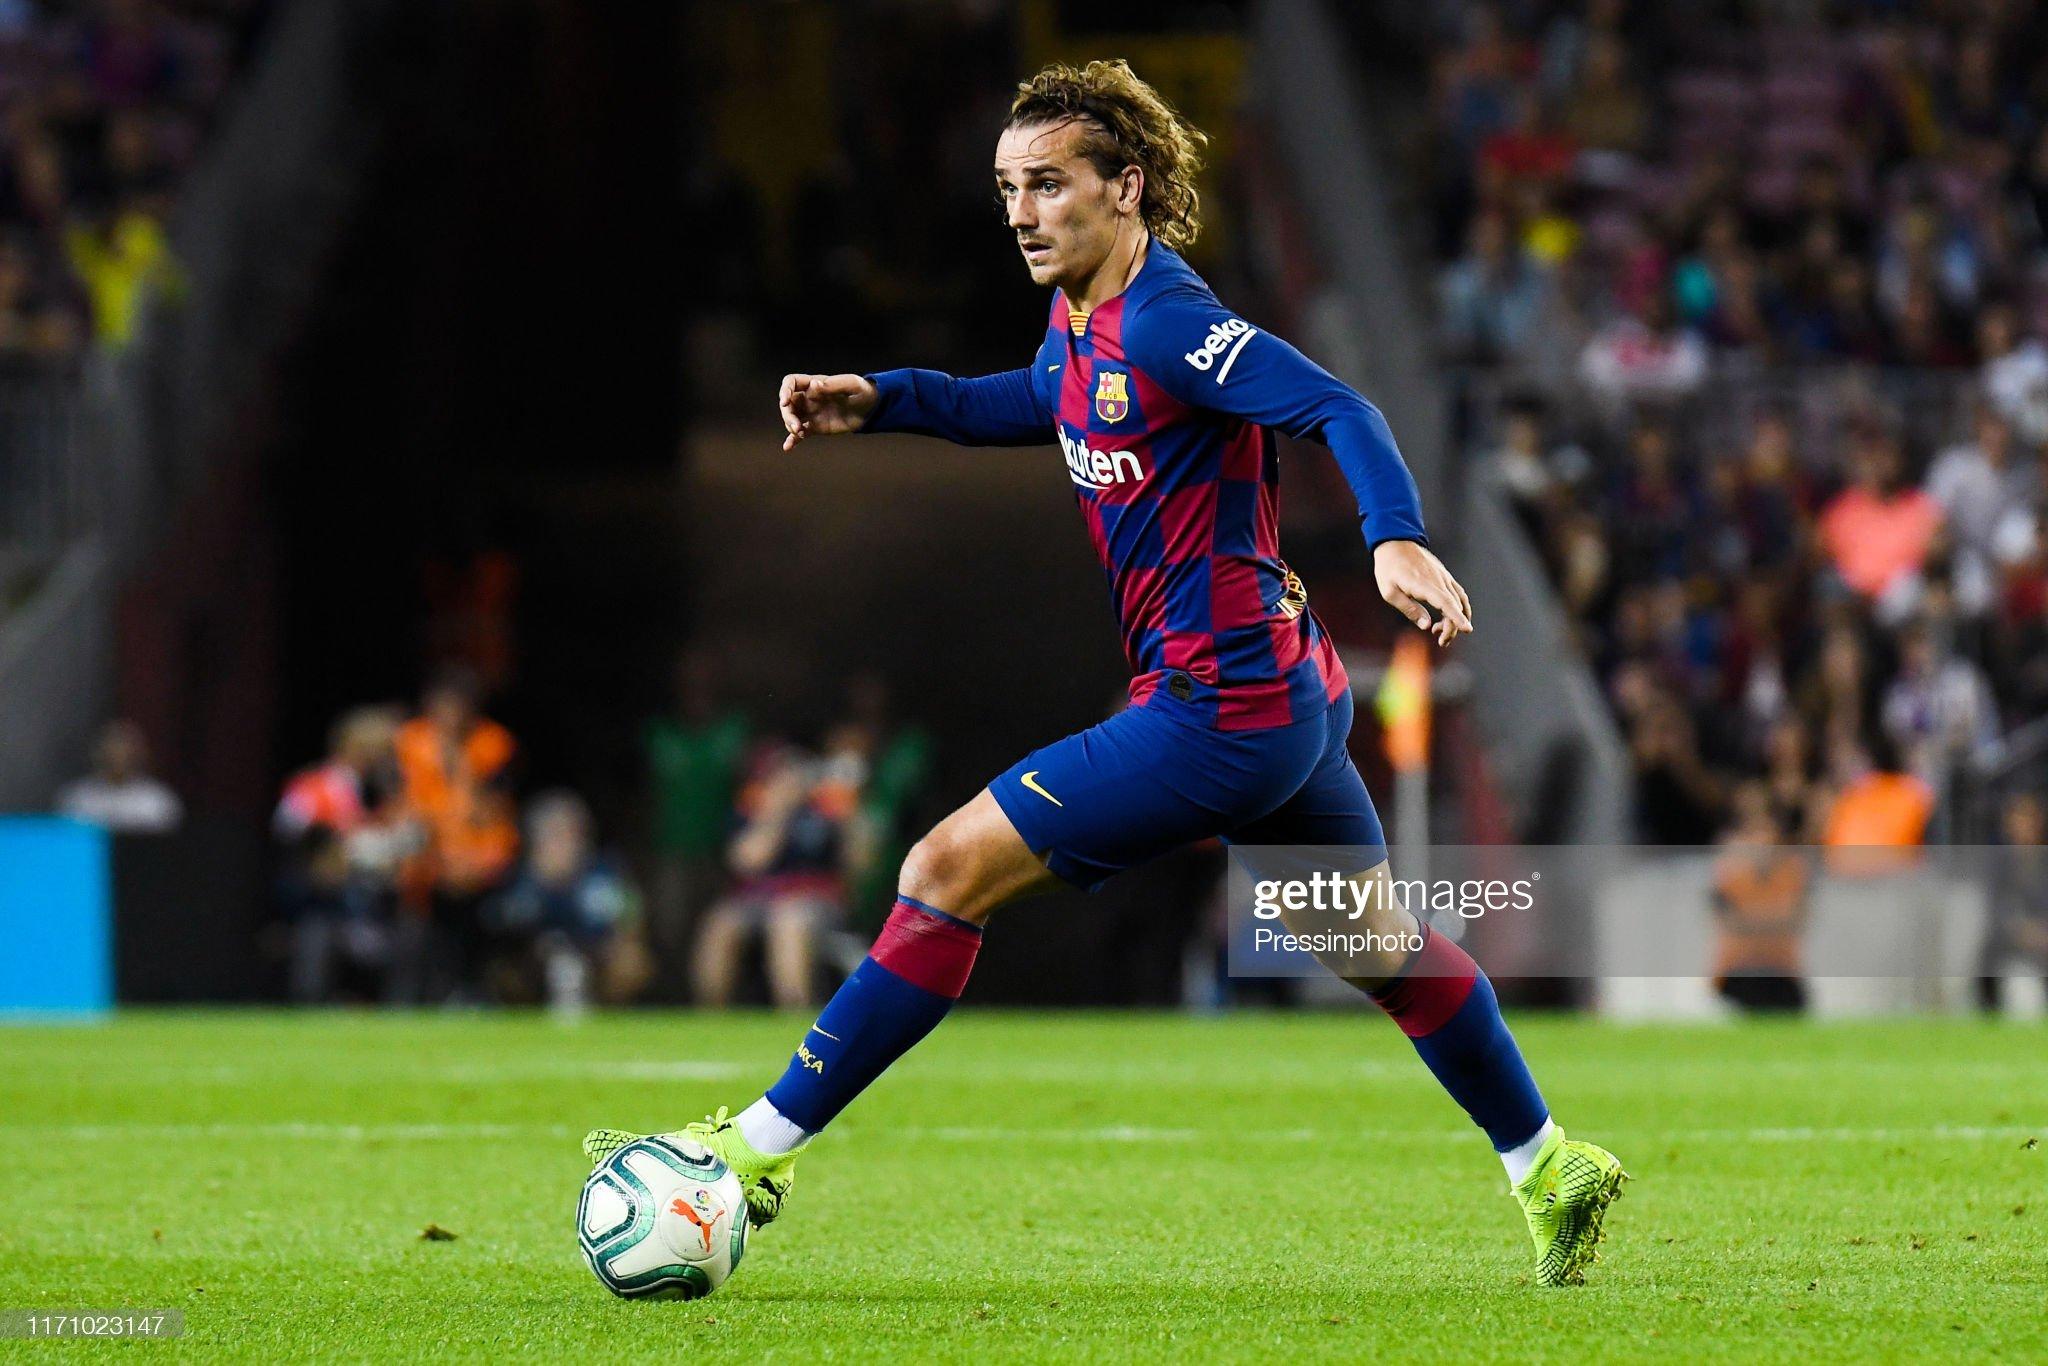 صور مباراة : برشلونة - فياريال 2-1 ( 24-09-2019 )  Antoine-griezmann-of-fc-barcelona-during-the-liga-match-between-and-picture-id1171023147?s=2048x2048